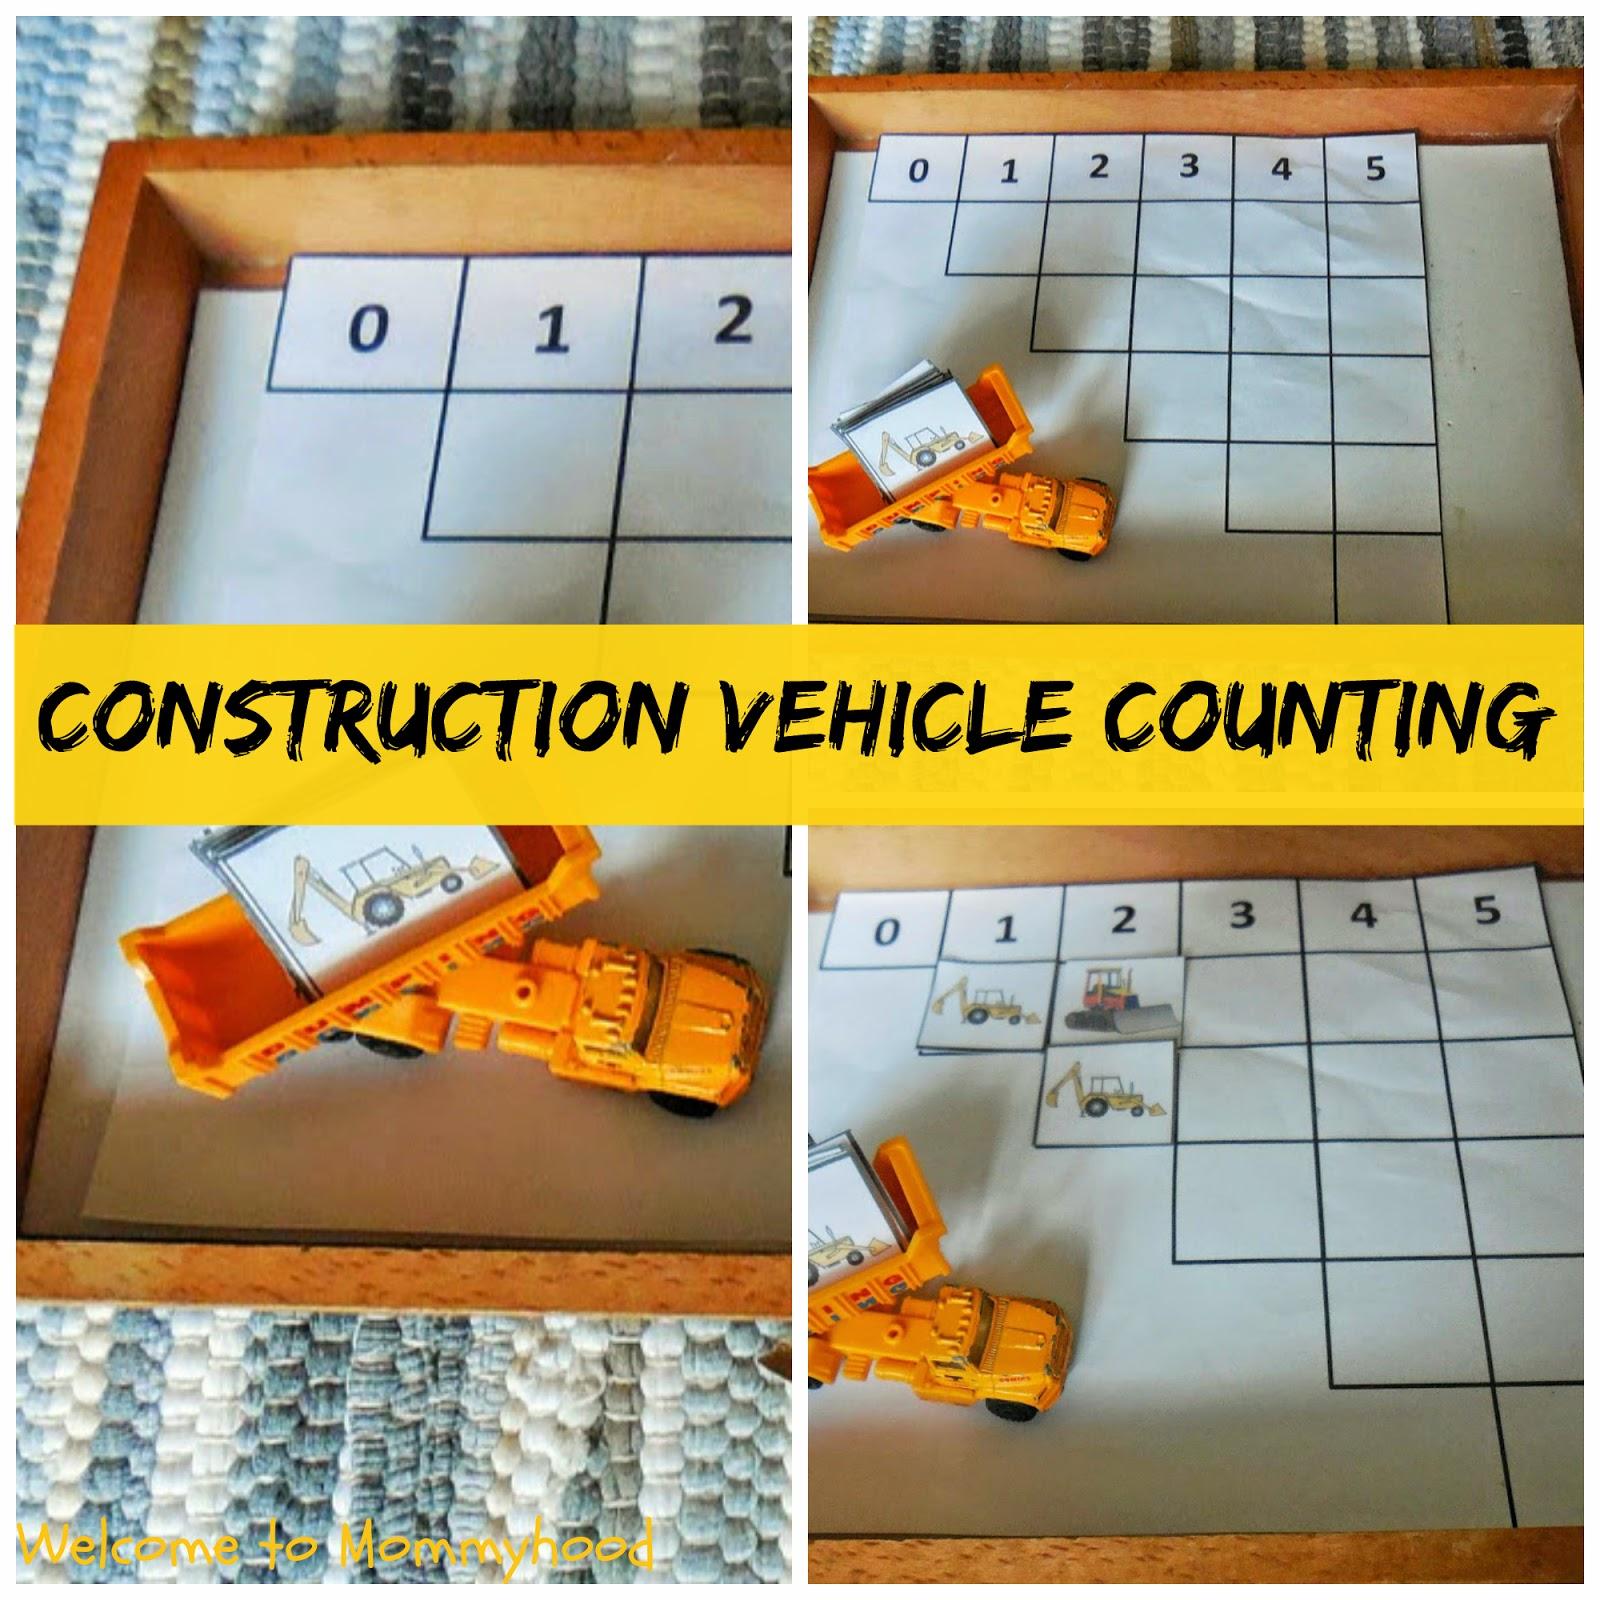 Vehicle toddler activities by Welcome to Mommyhood [Montessori inspired] #toddleractivities, #Montessori